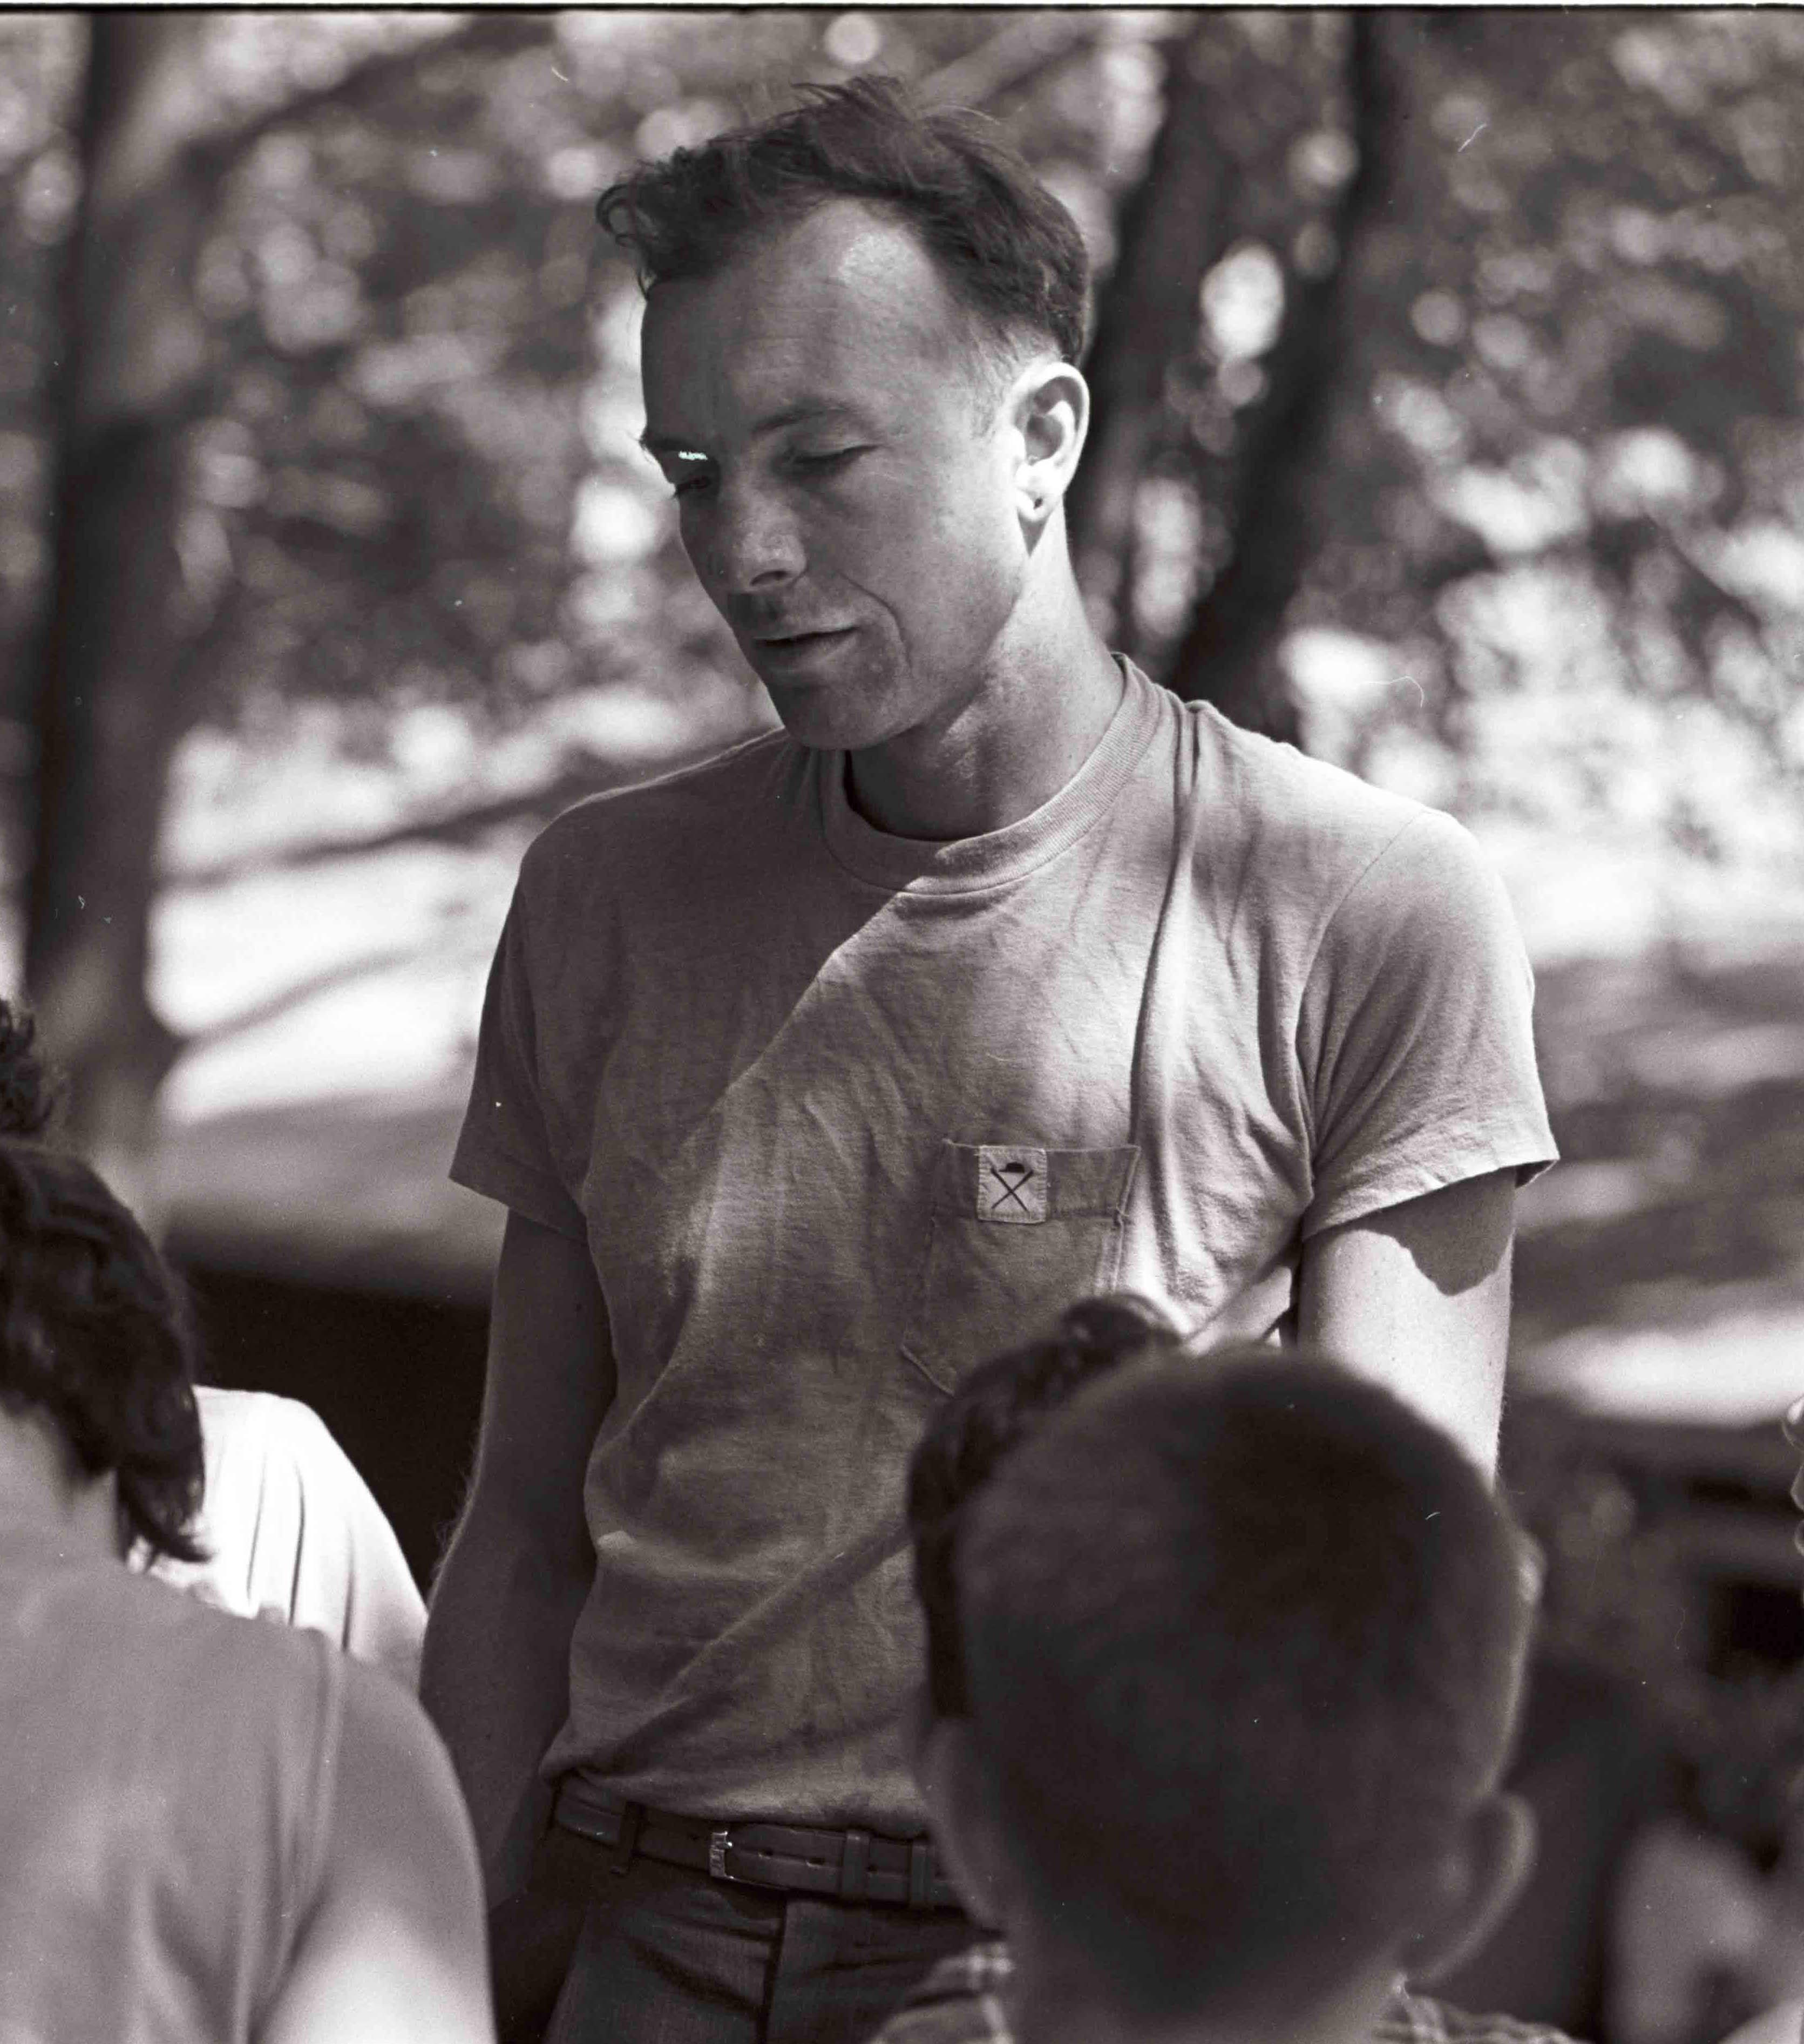 Pete Seeger at Camp Woodland, Phoenicia, New Yok, circa 1940s